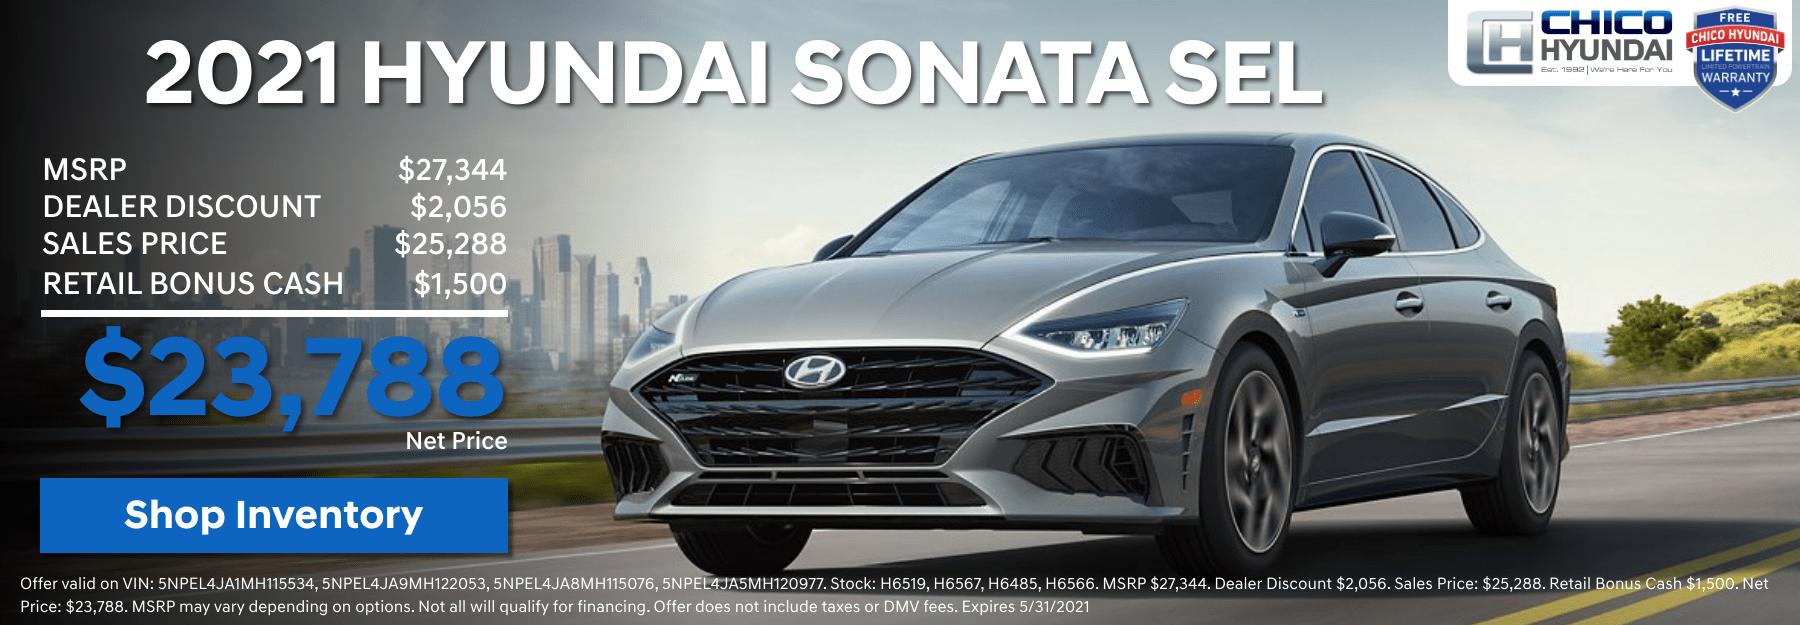 Sonata Discount-1800x625px